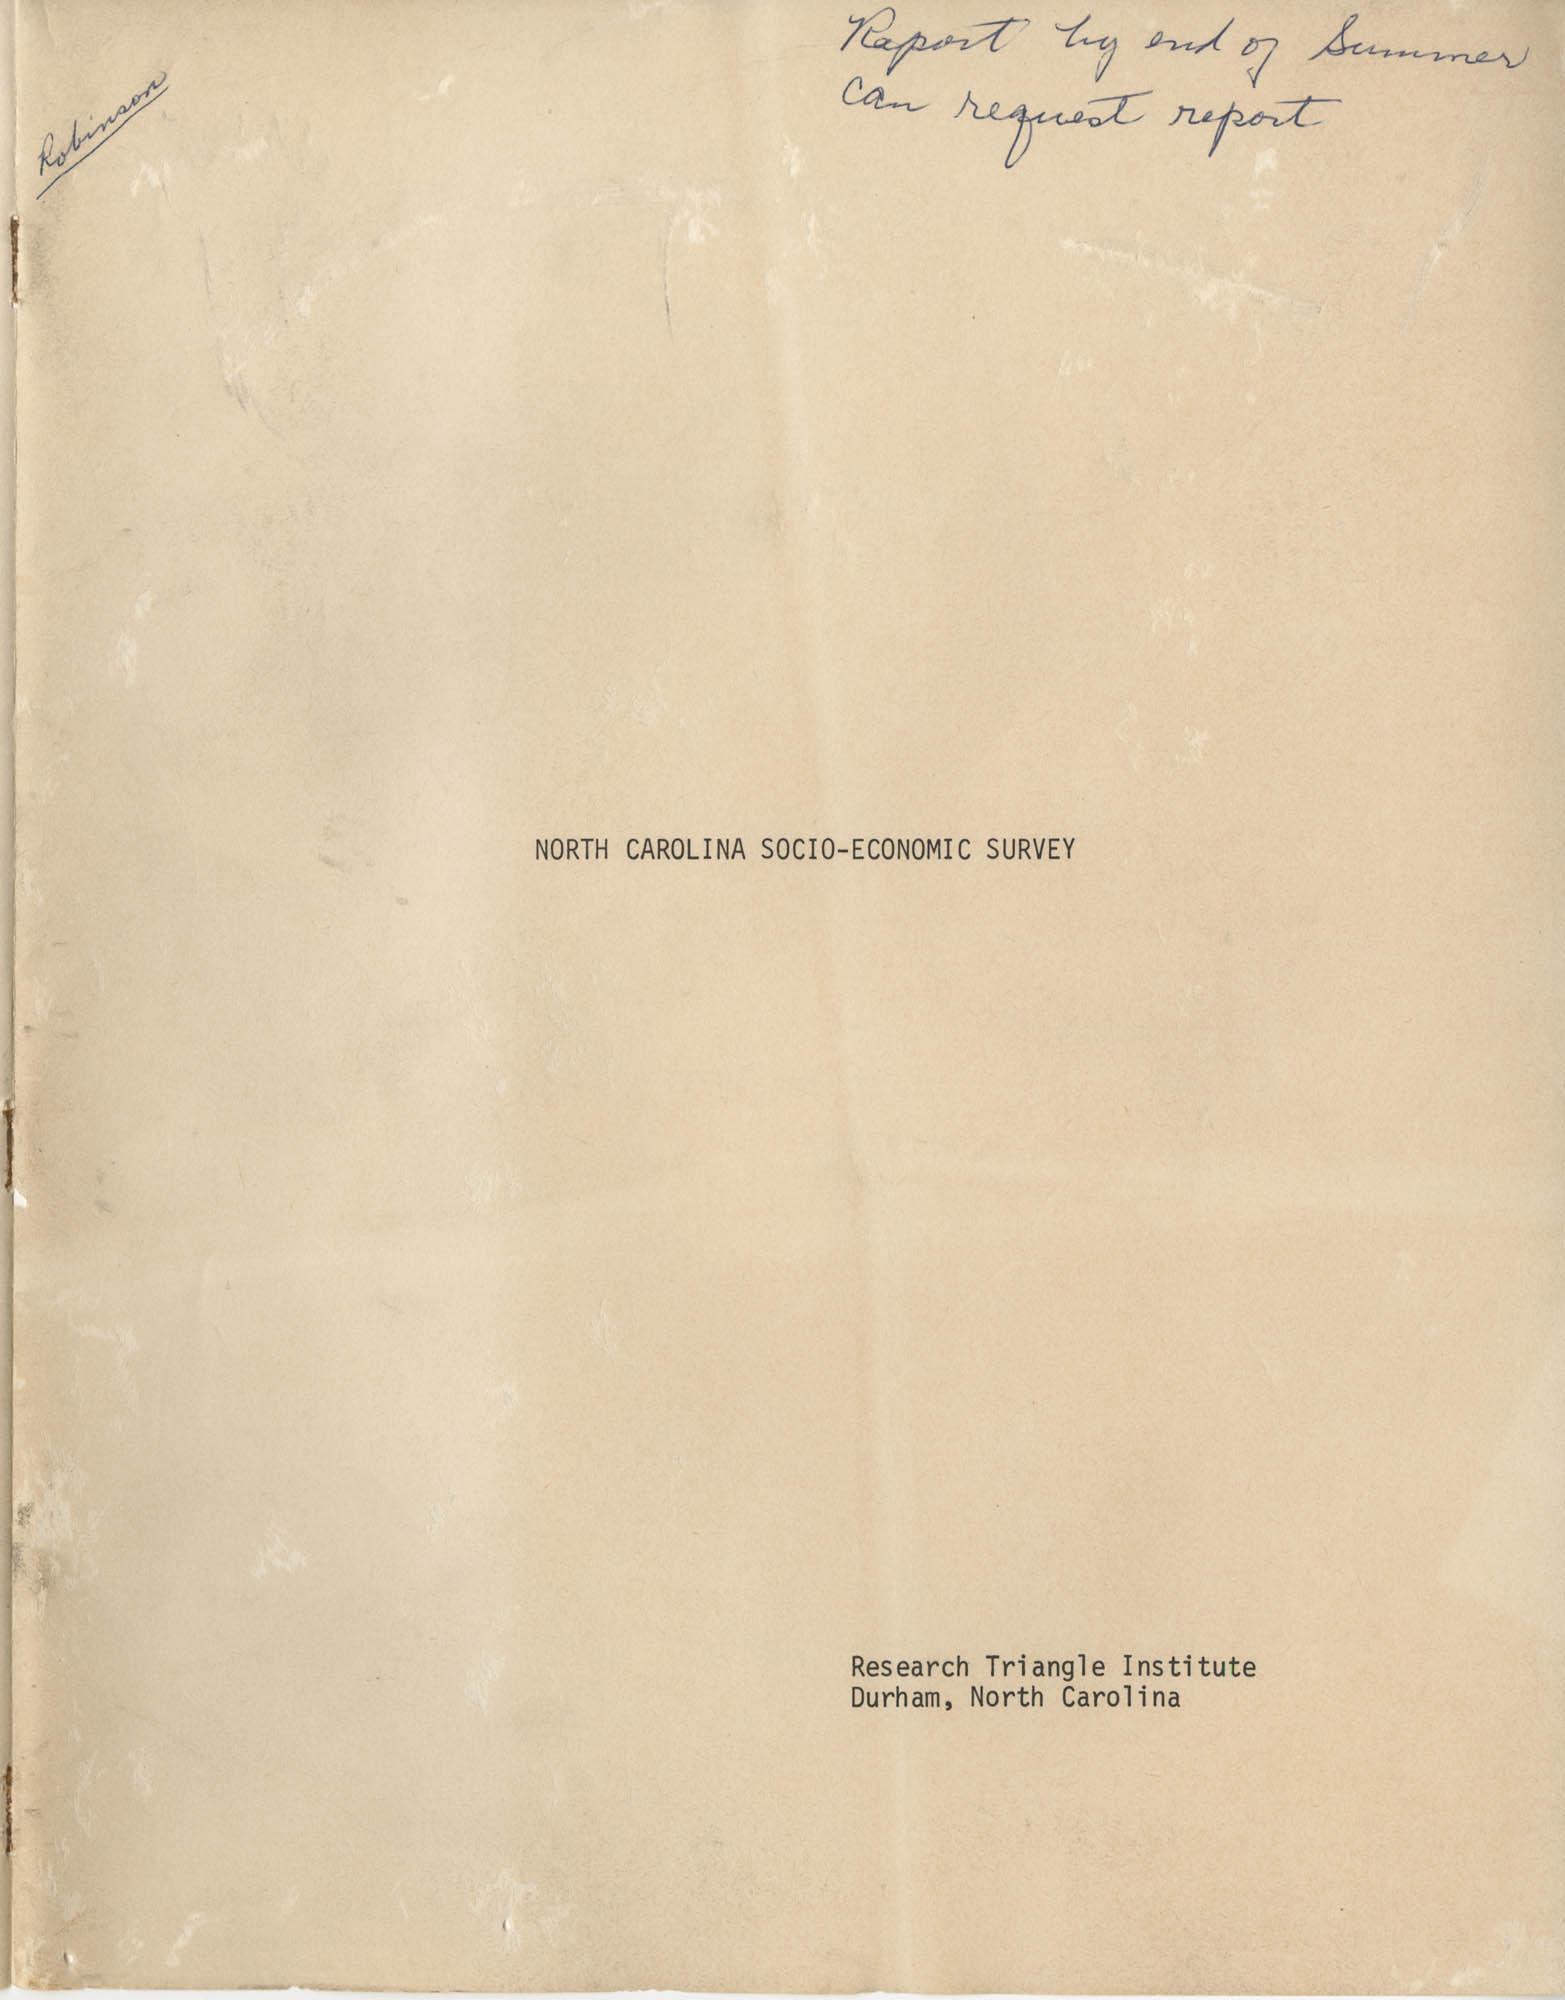 North Carolina Socio-Economic Survey, Front Cover